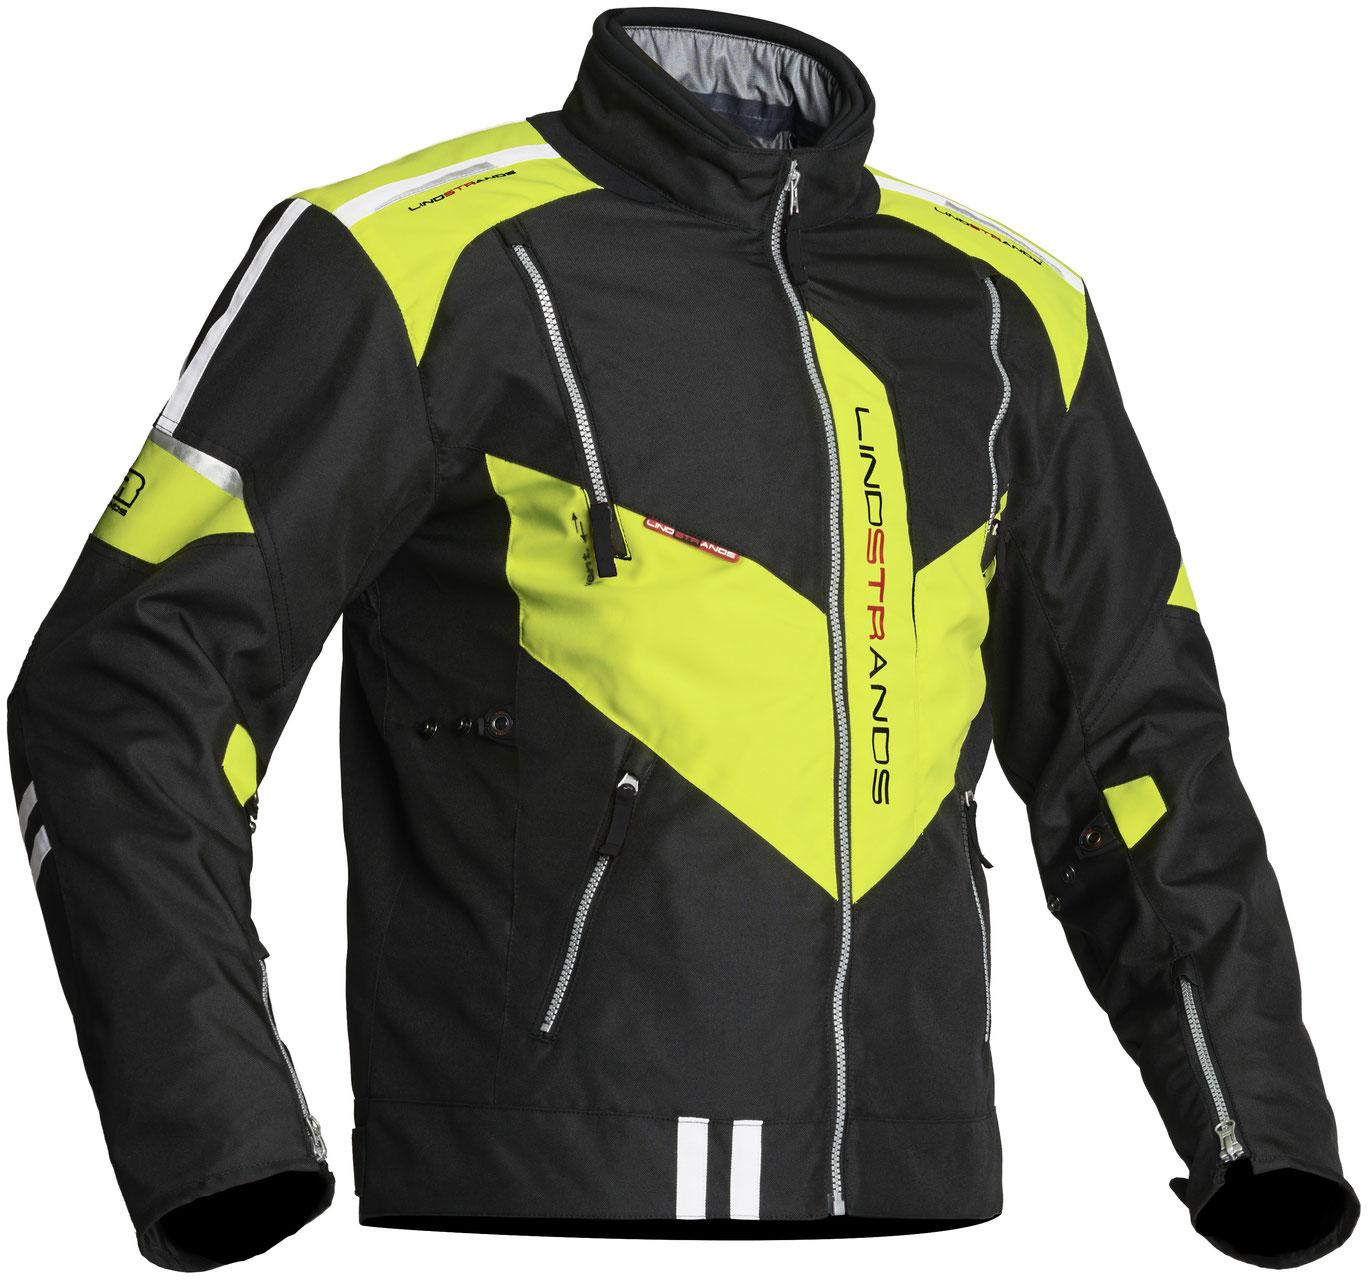 402c3182 Textiljacken - Motorradhelm Motorradkleider Jofama Halvarssons Spada ...